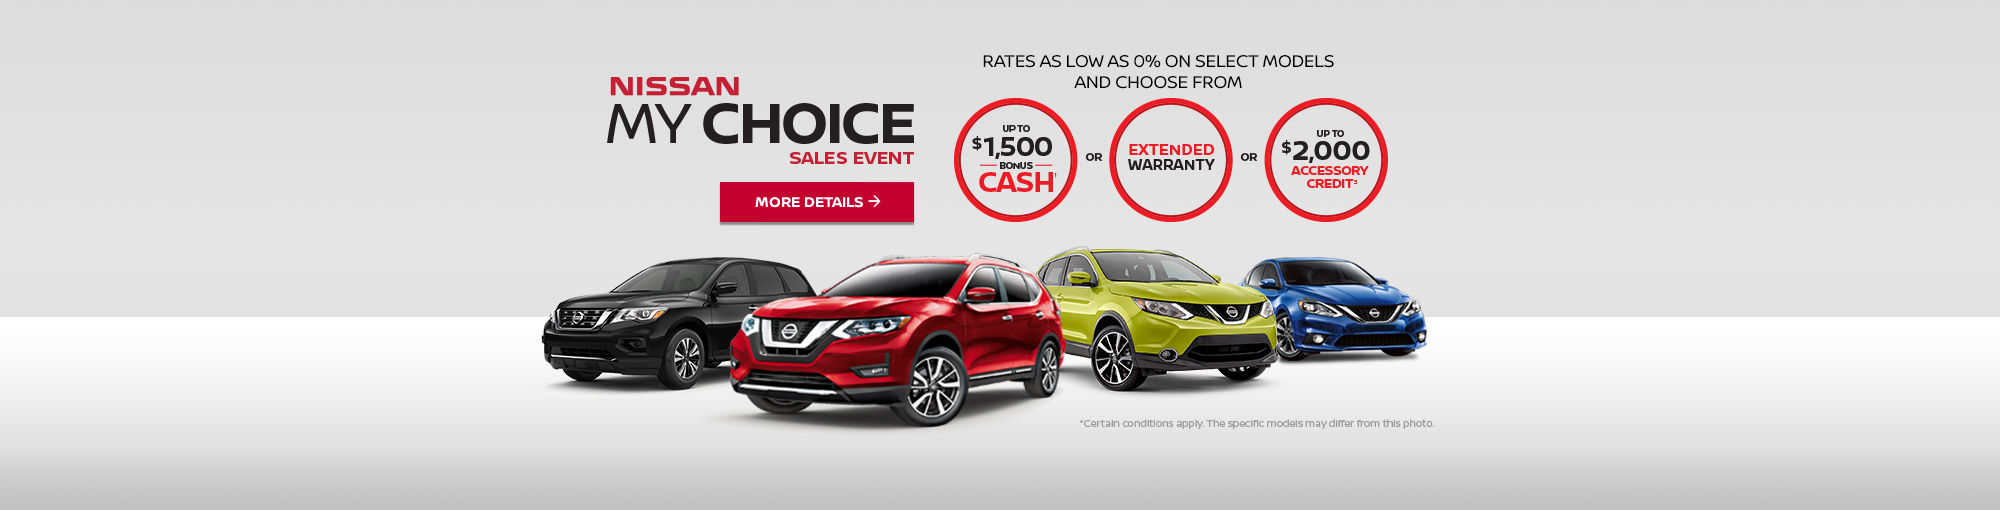 Nissan My Choice Sales Event (web)